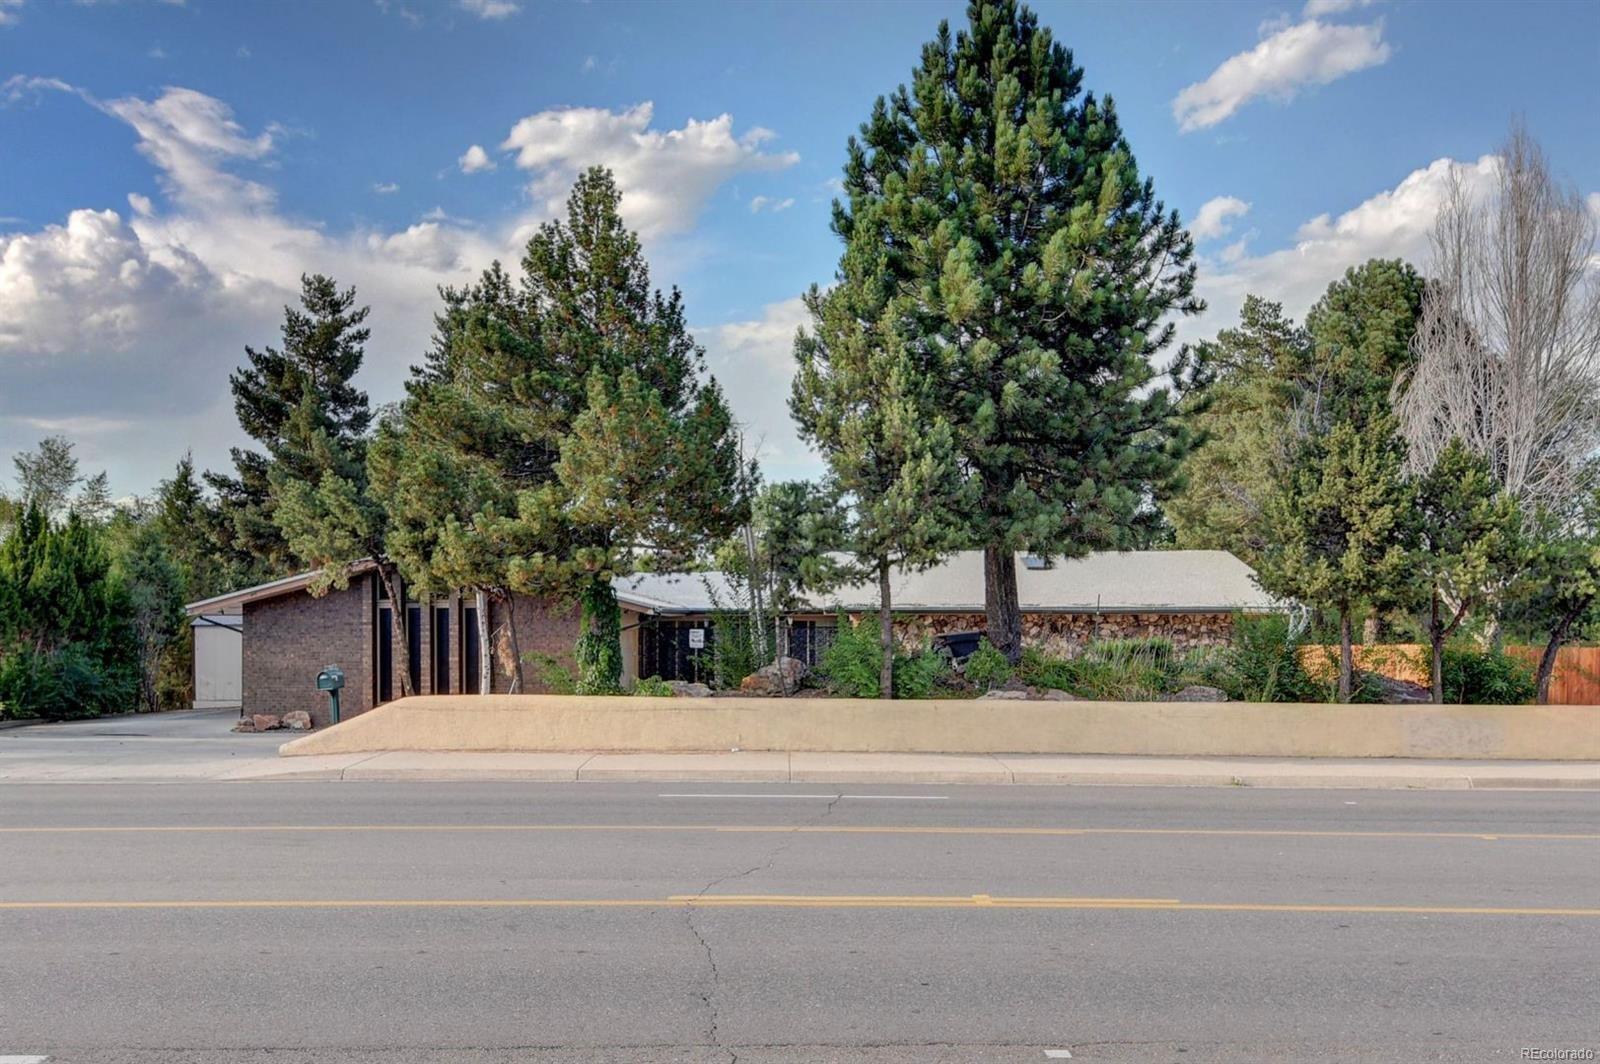 MLS# 7427025 - 1 - 5415 W Jewell Avenue, Lakewood, CO 80232